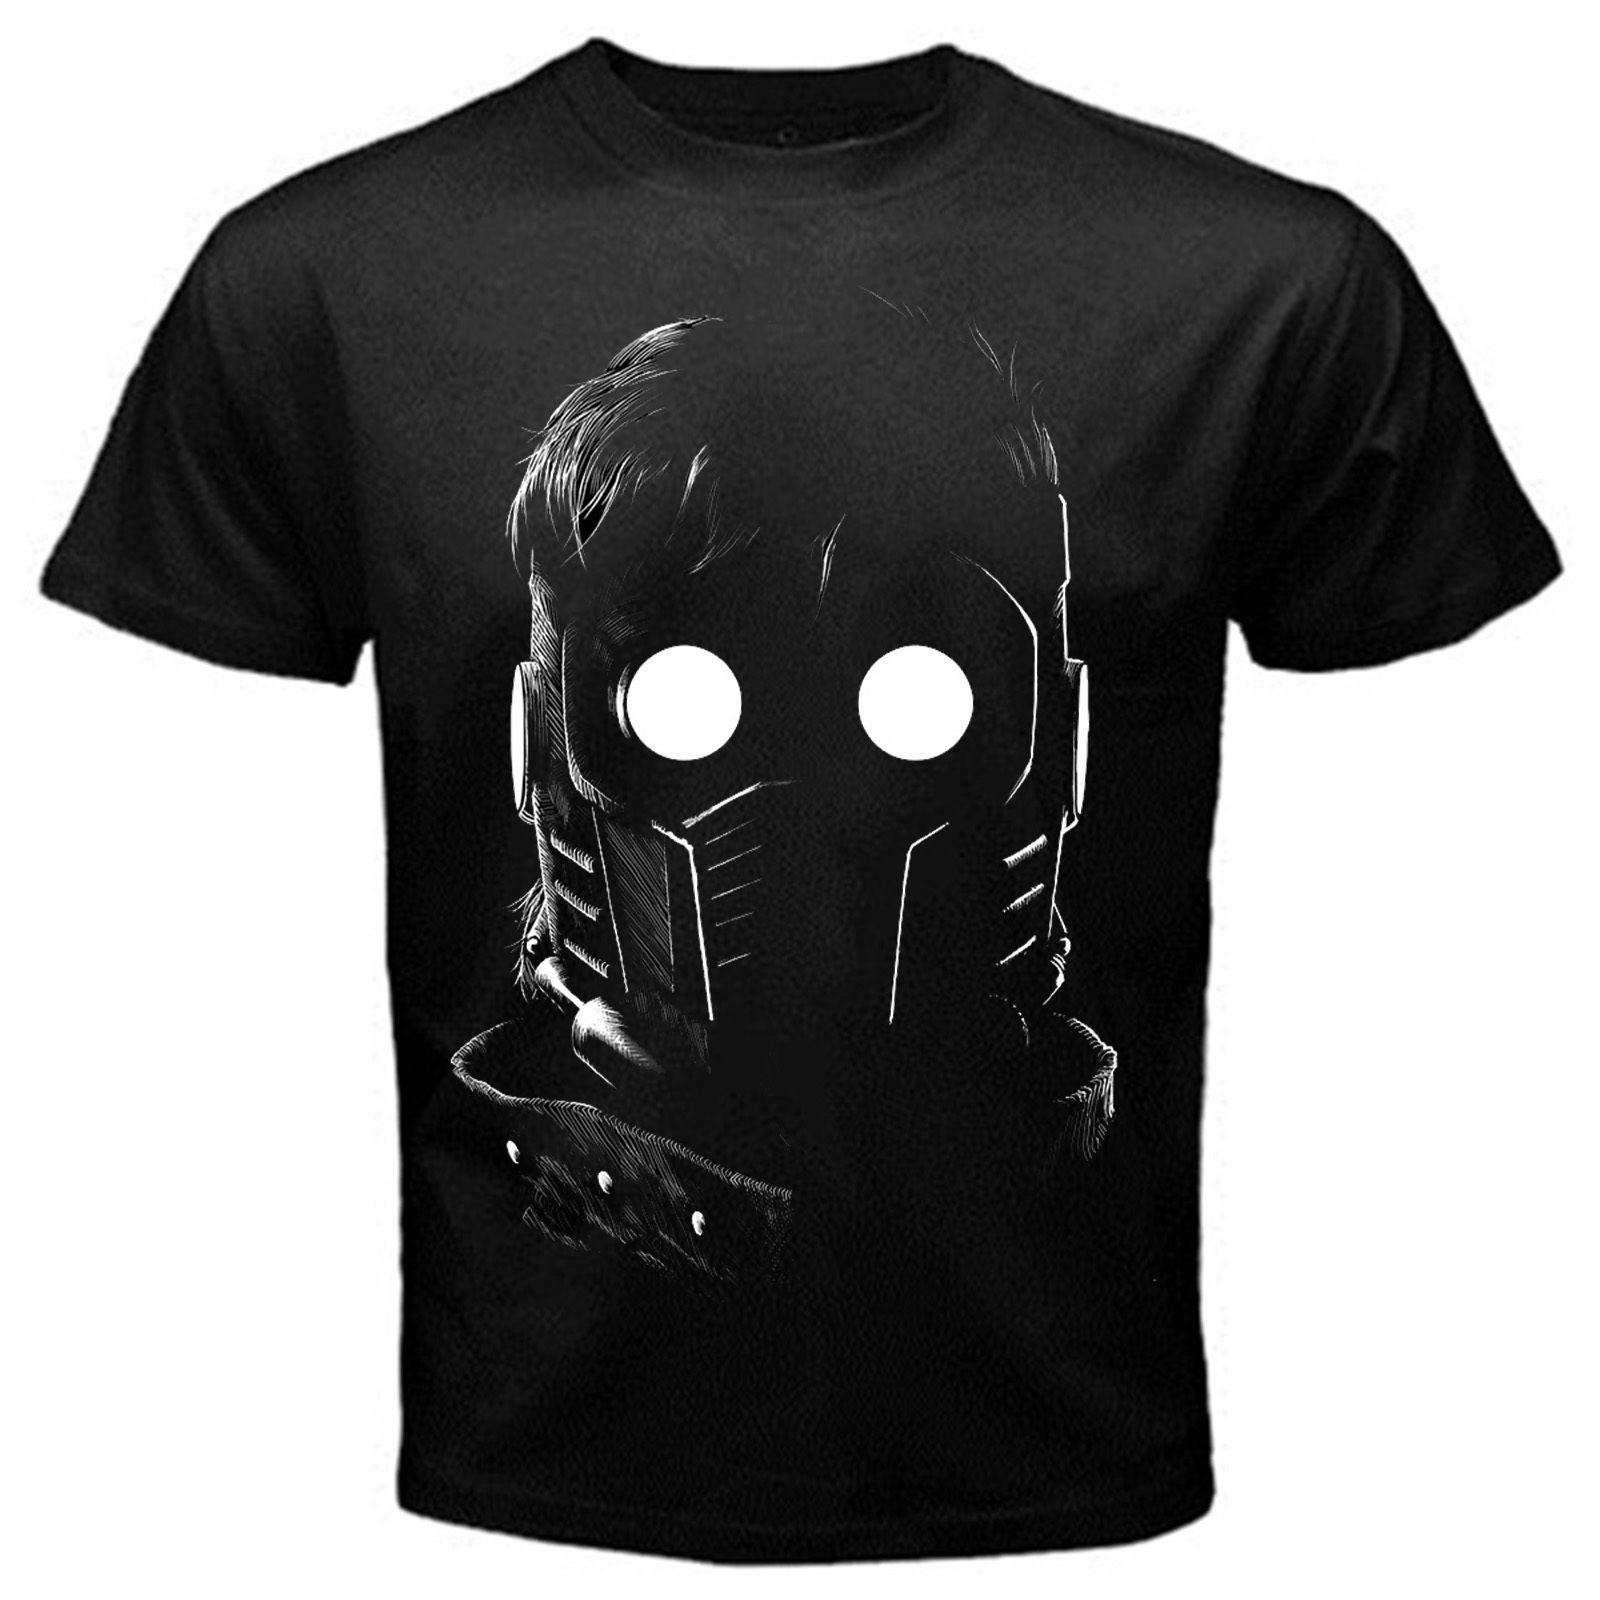 Starlord Guardian of the Galaxy movie cartoon T-Shirt Black Basic Tee